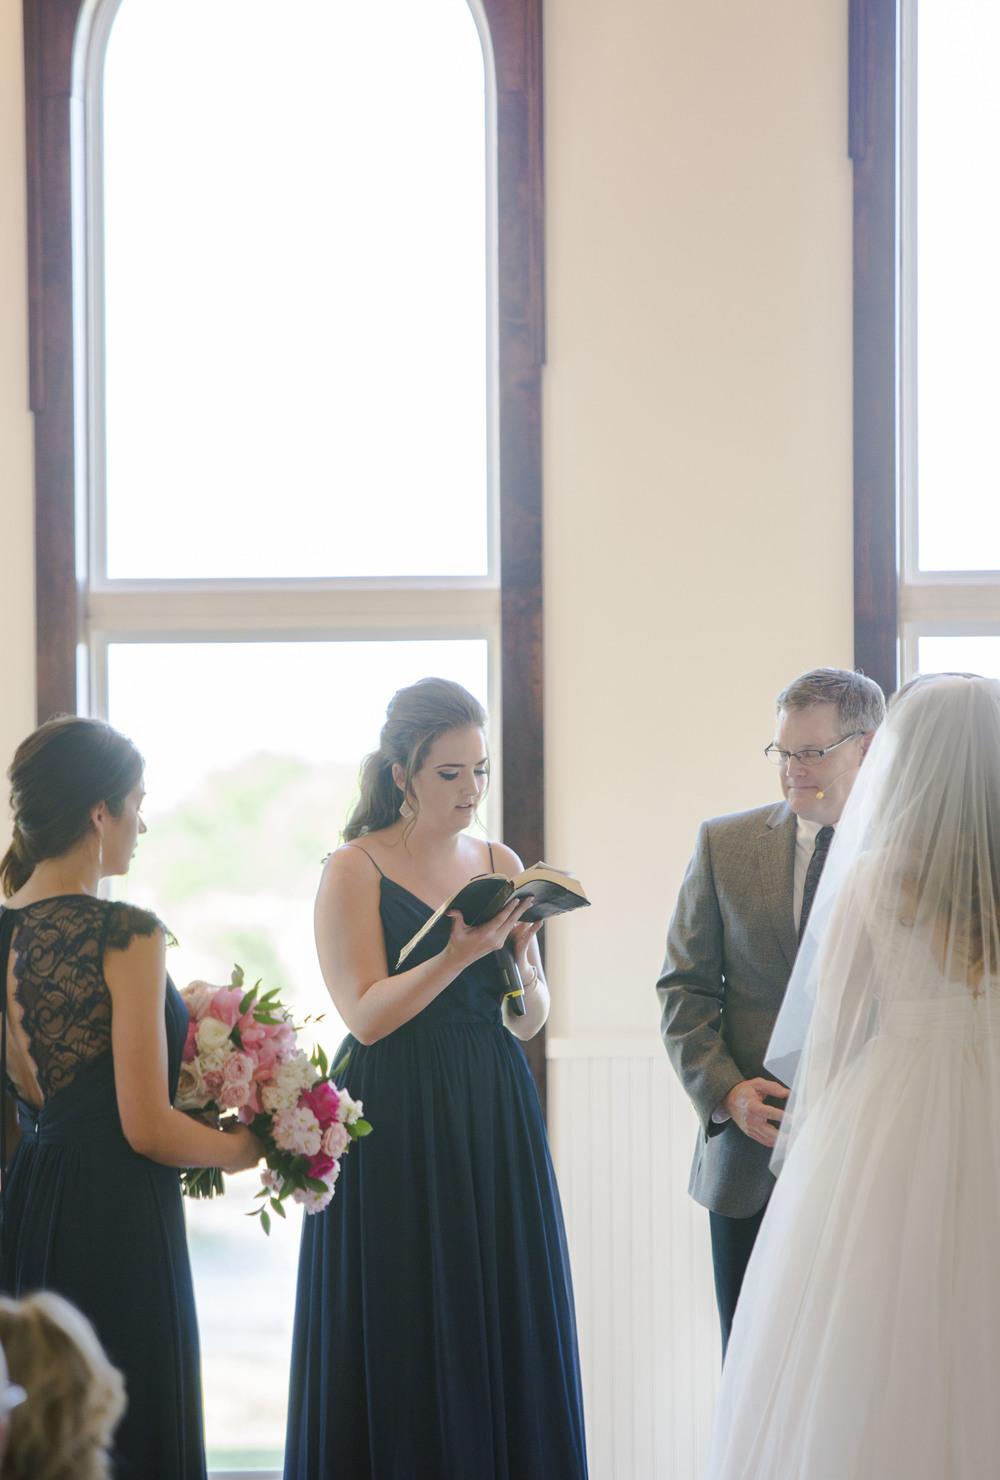 ATGI_Cory & Jackie_Wedding_2S8A2945.jpg